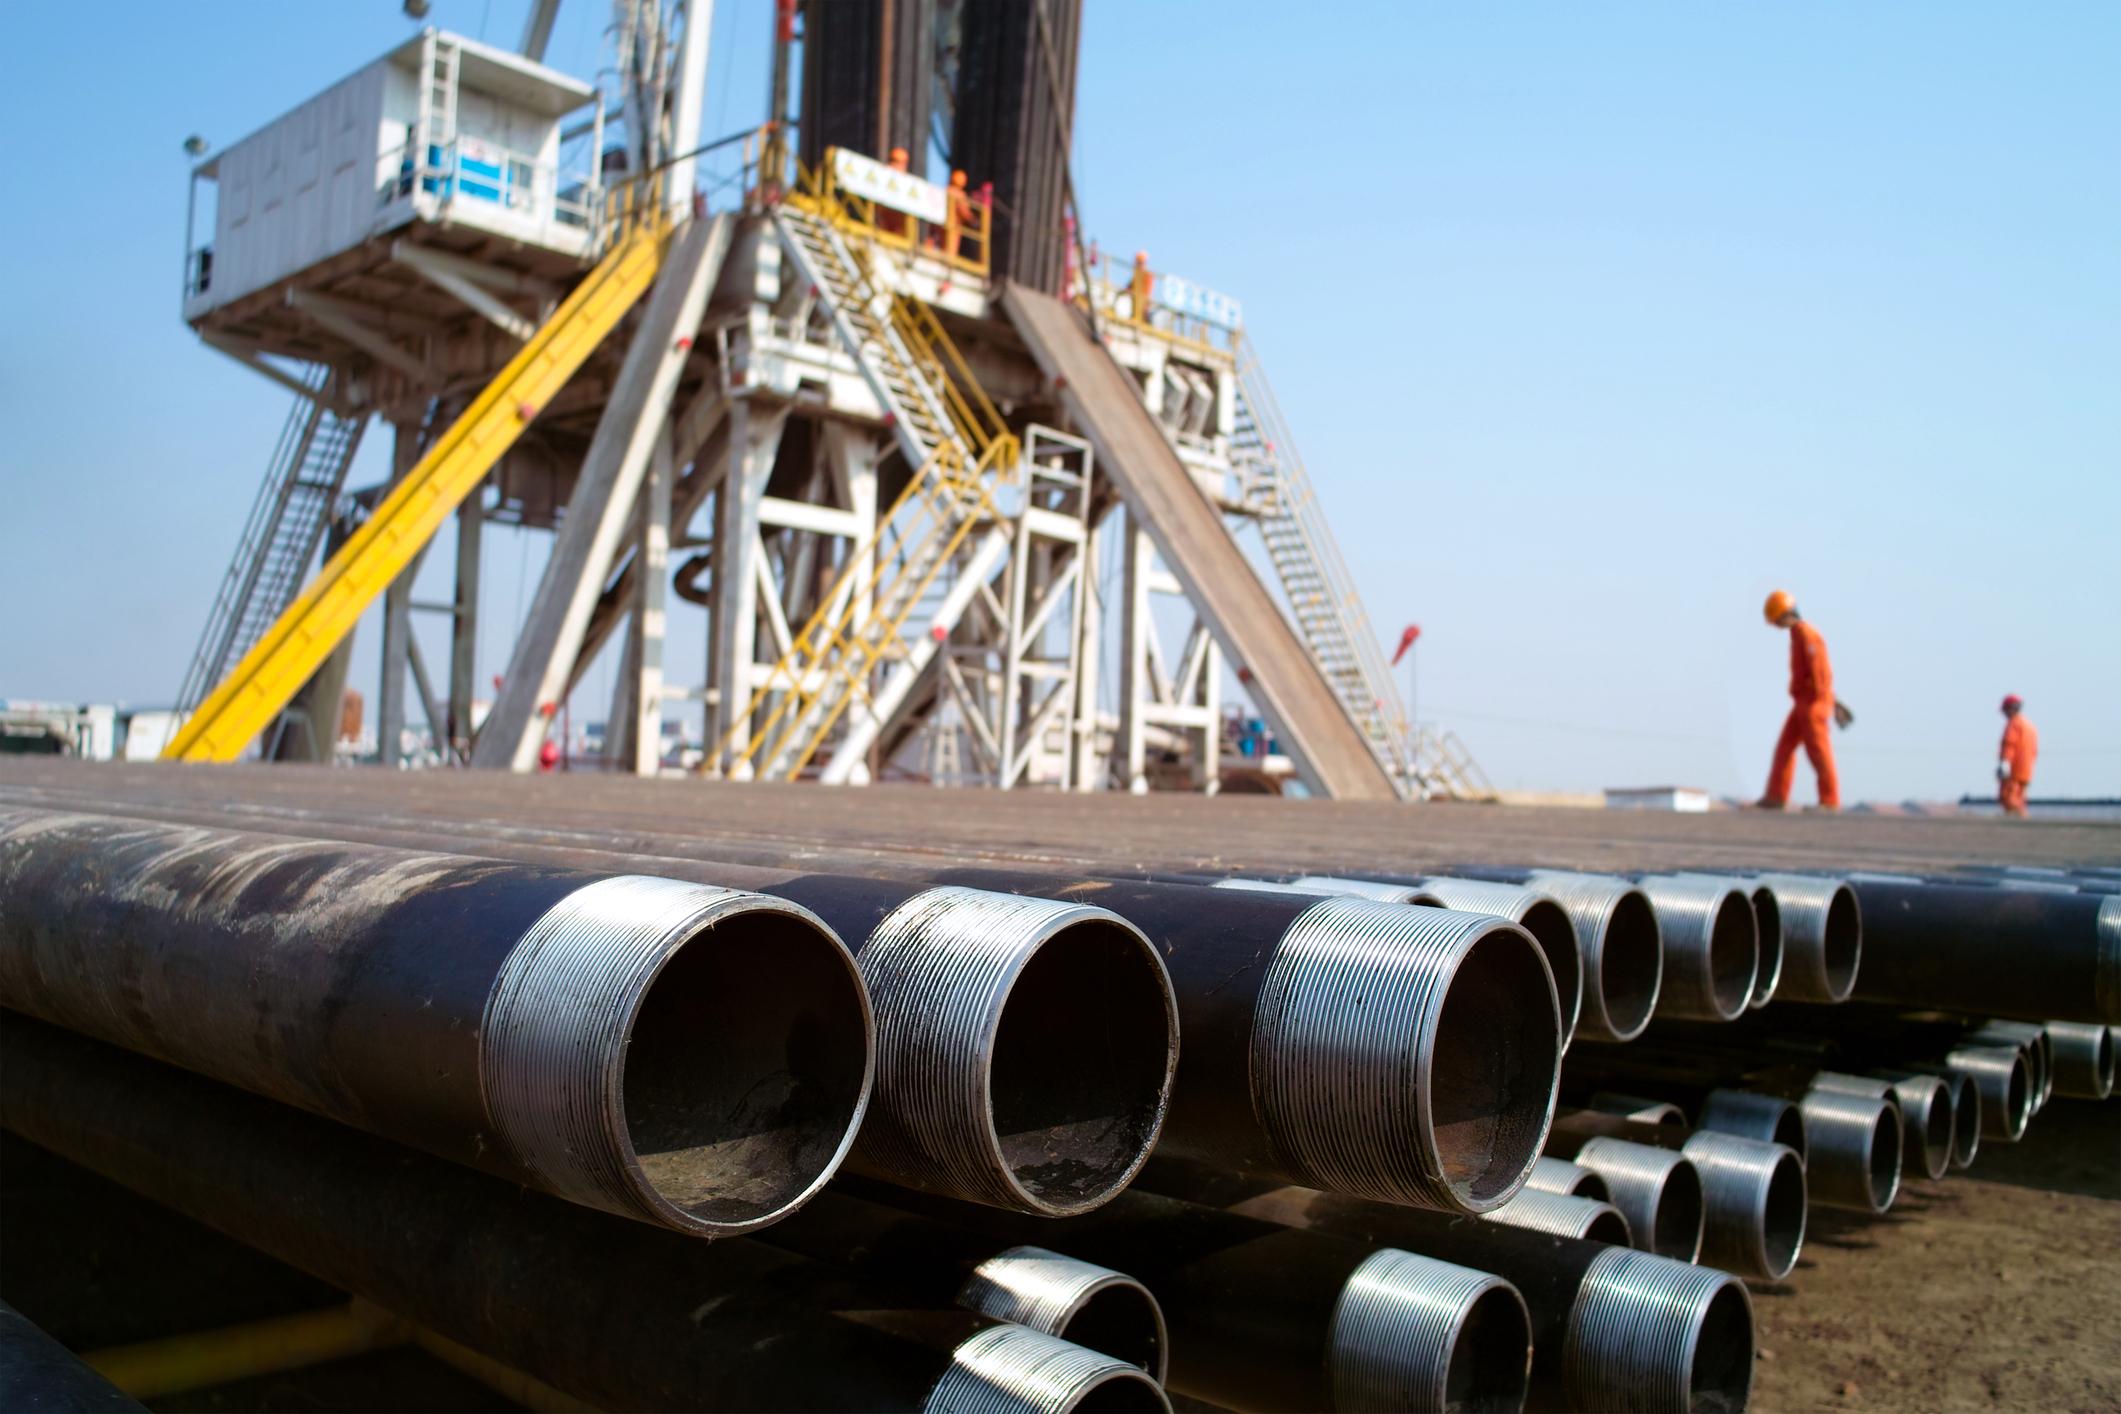 Pipes near an oil rig